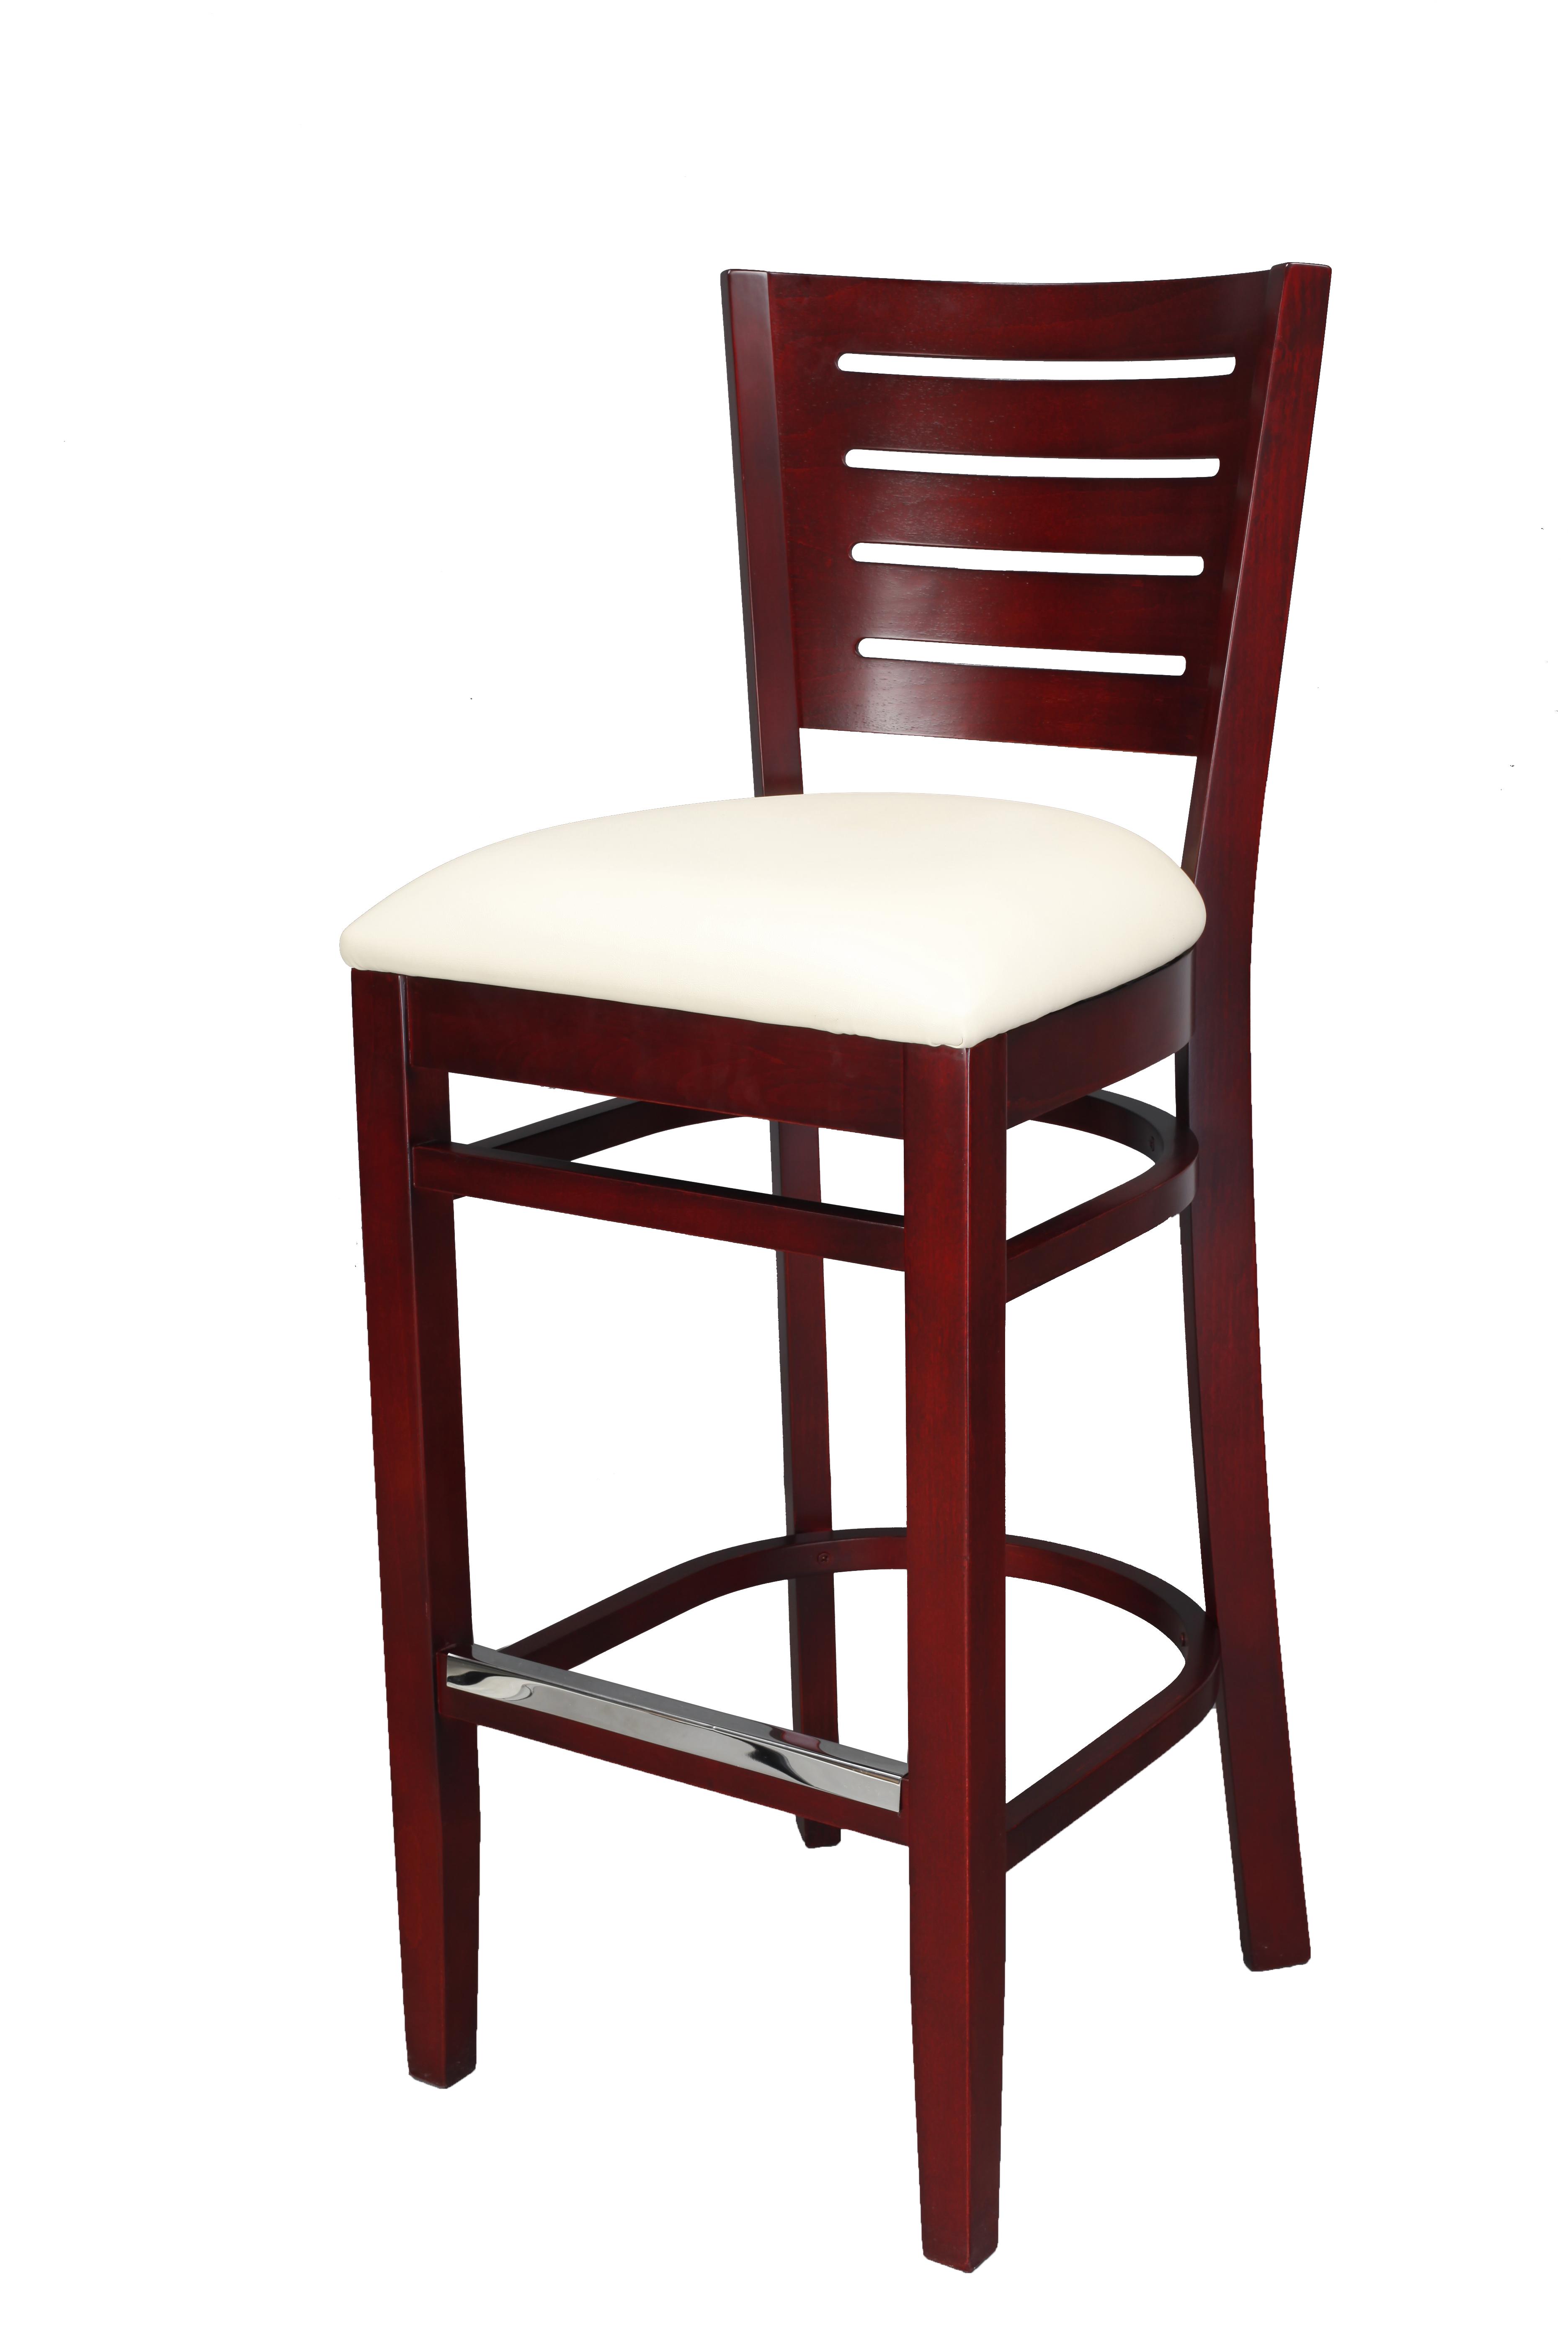 Wood bar stools millennium seating usa restaurant